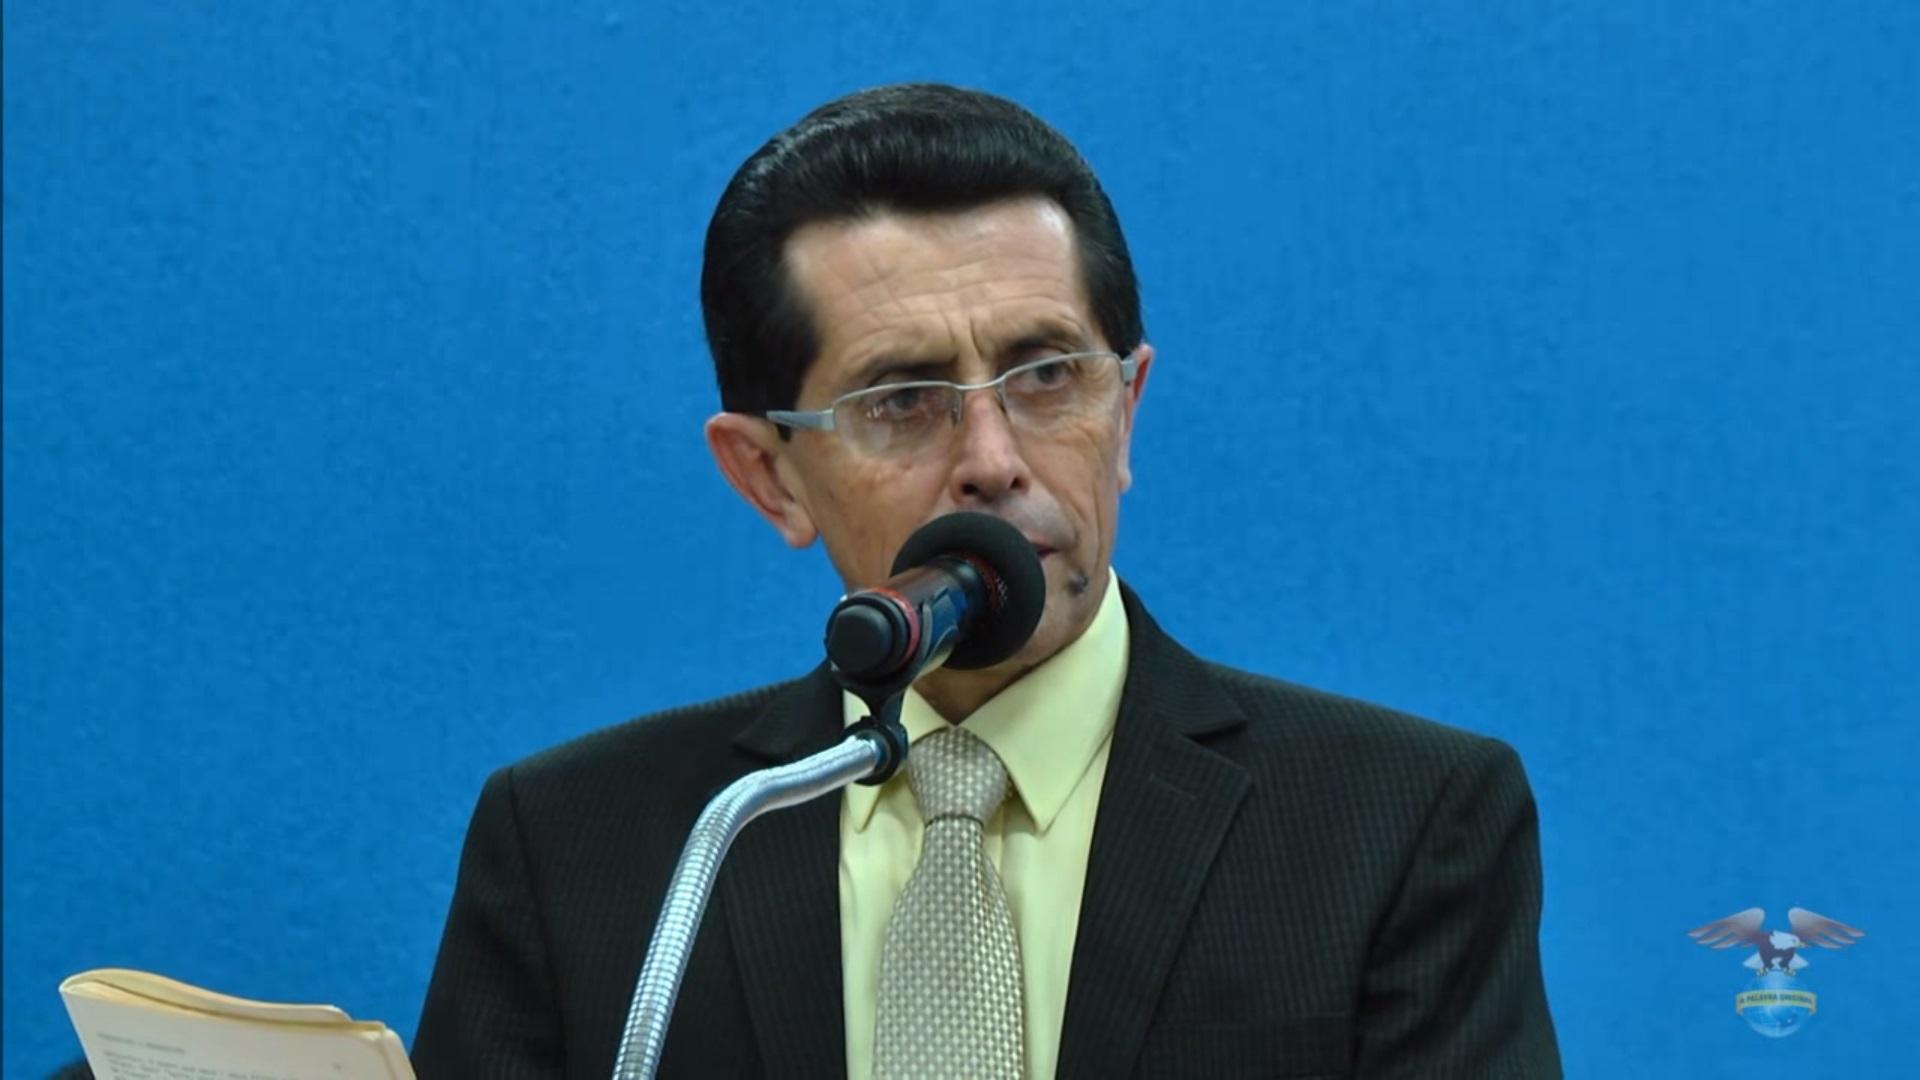 Pastor Mauro Luiz Cardoso - Anápolis-GO